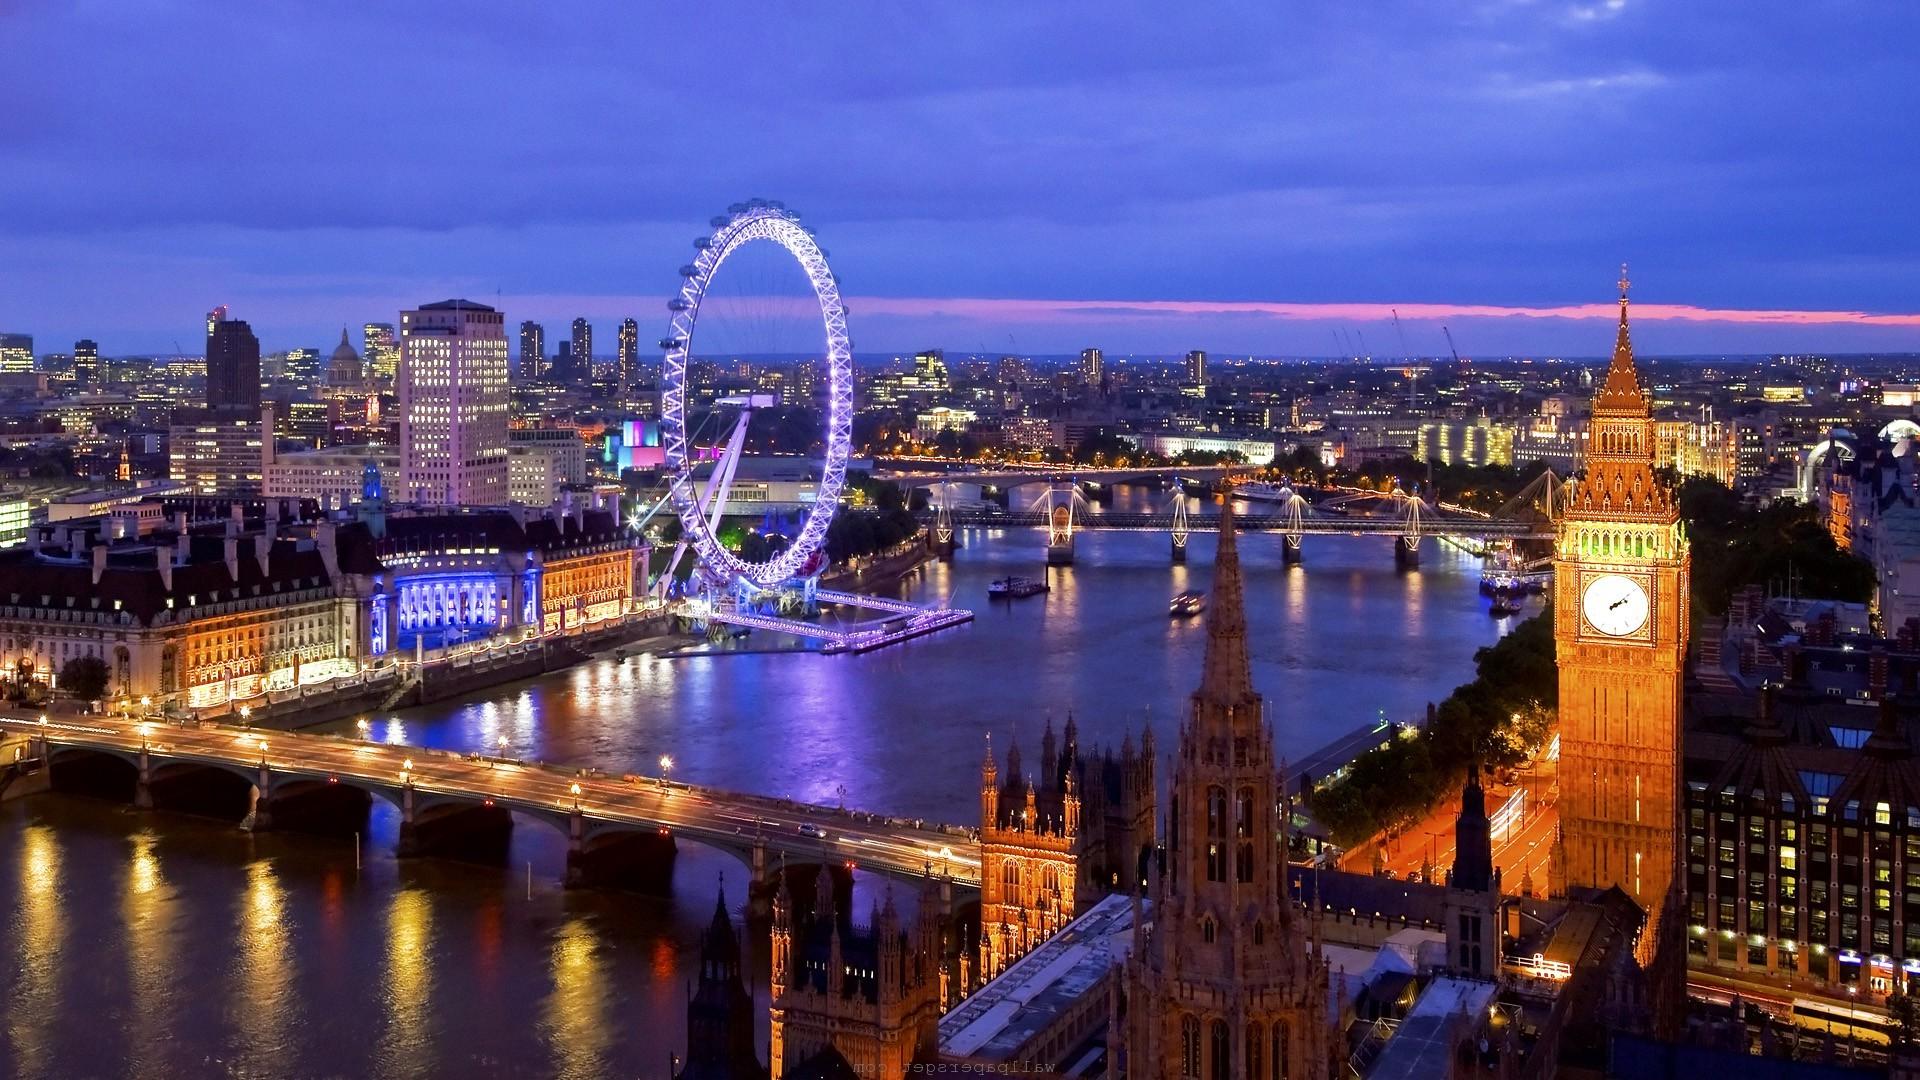 LONDON (LD4)